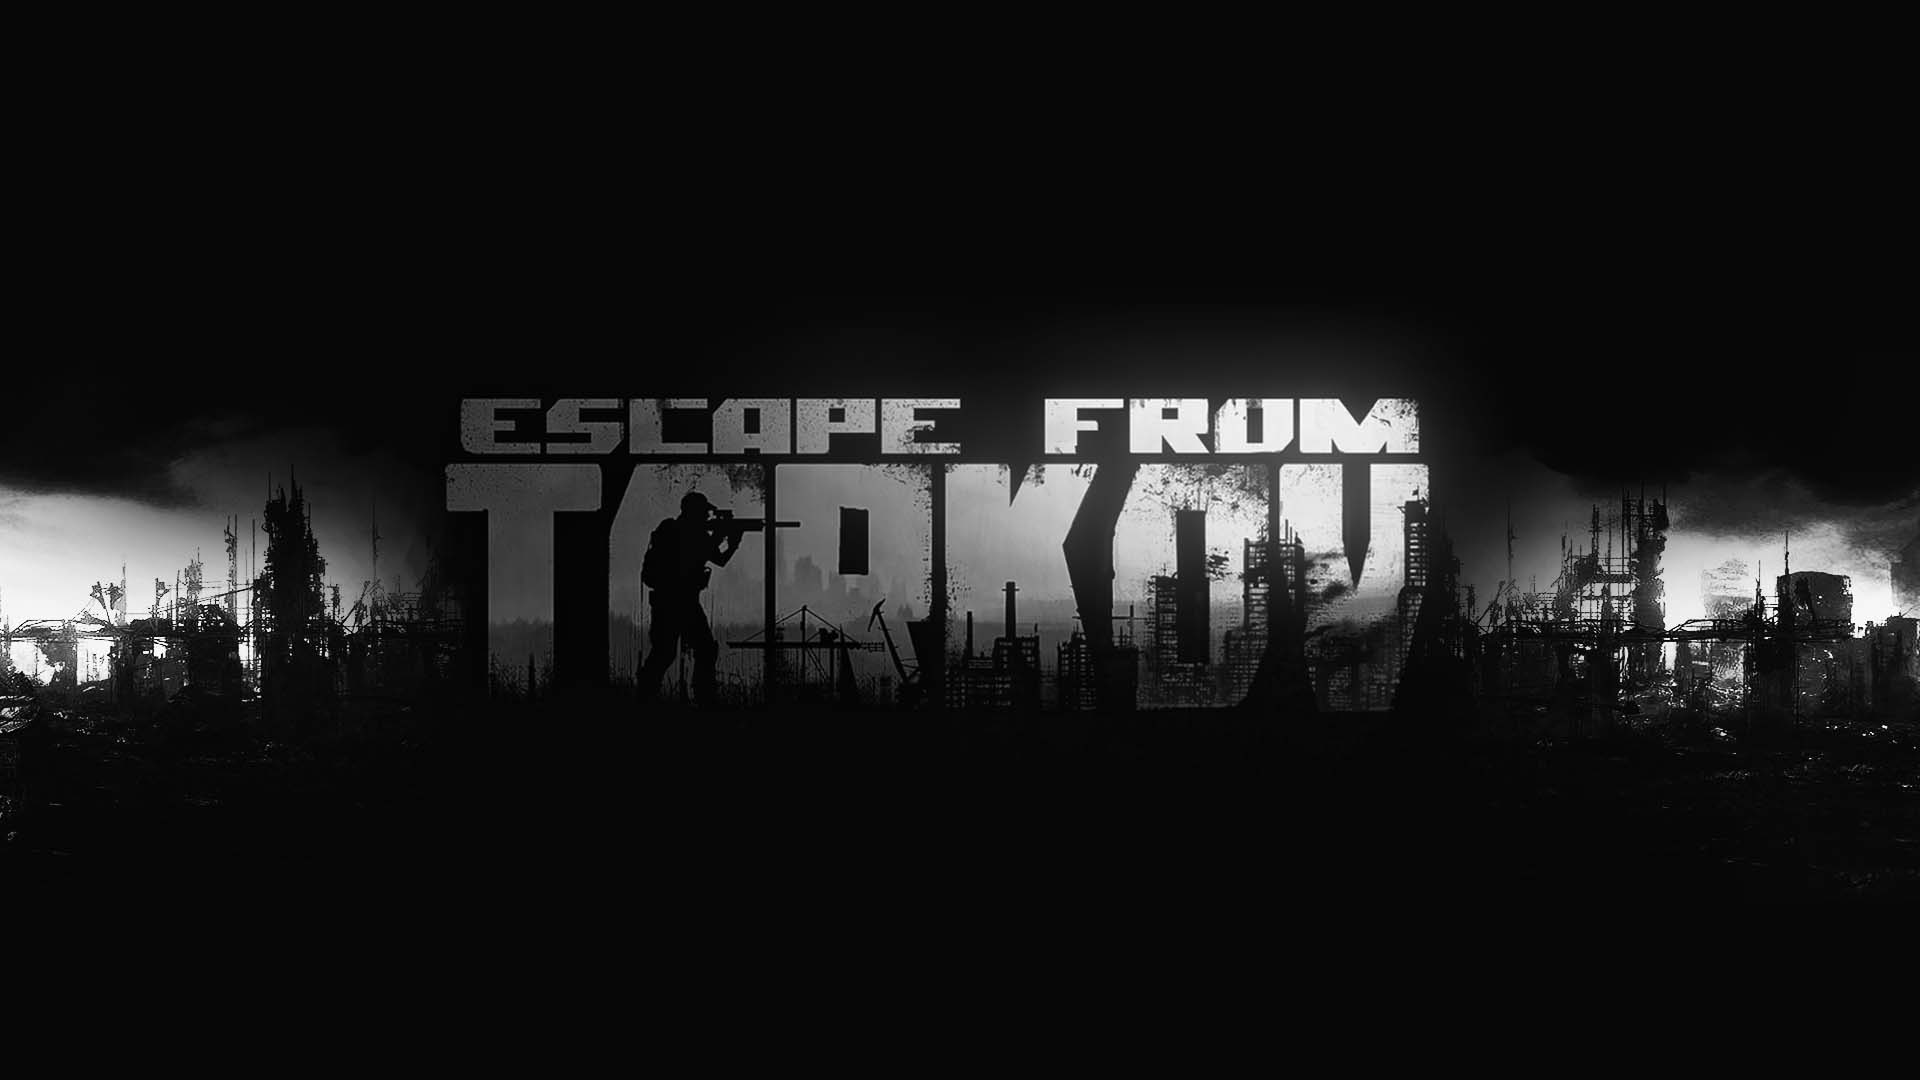 Wallpapers De Escape From Tarkov